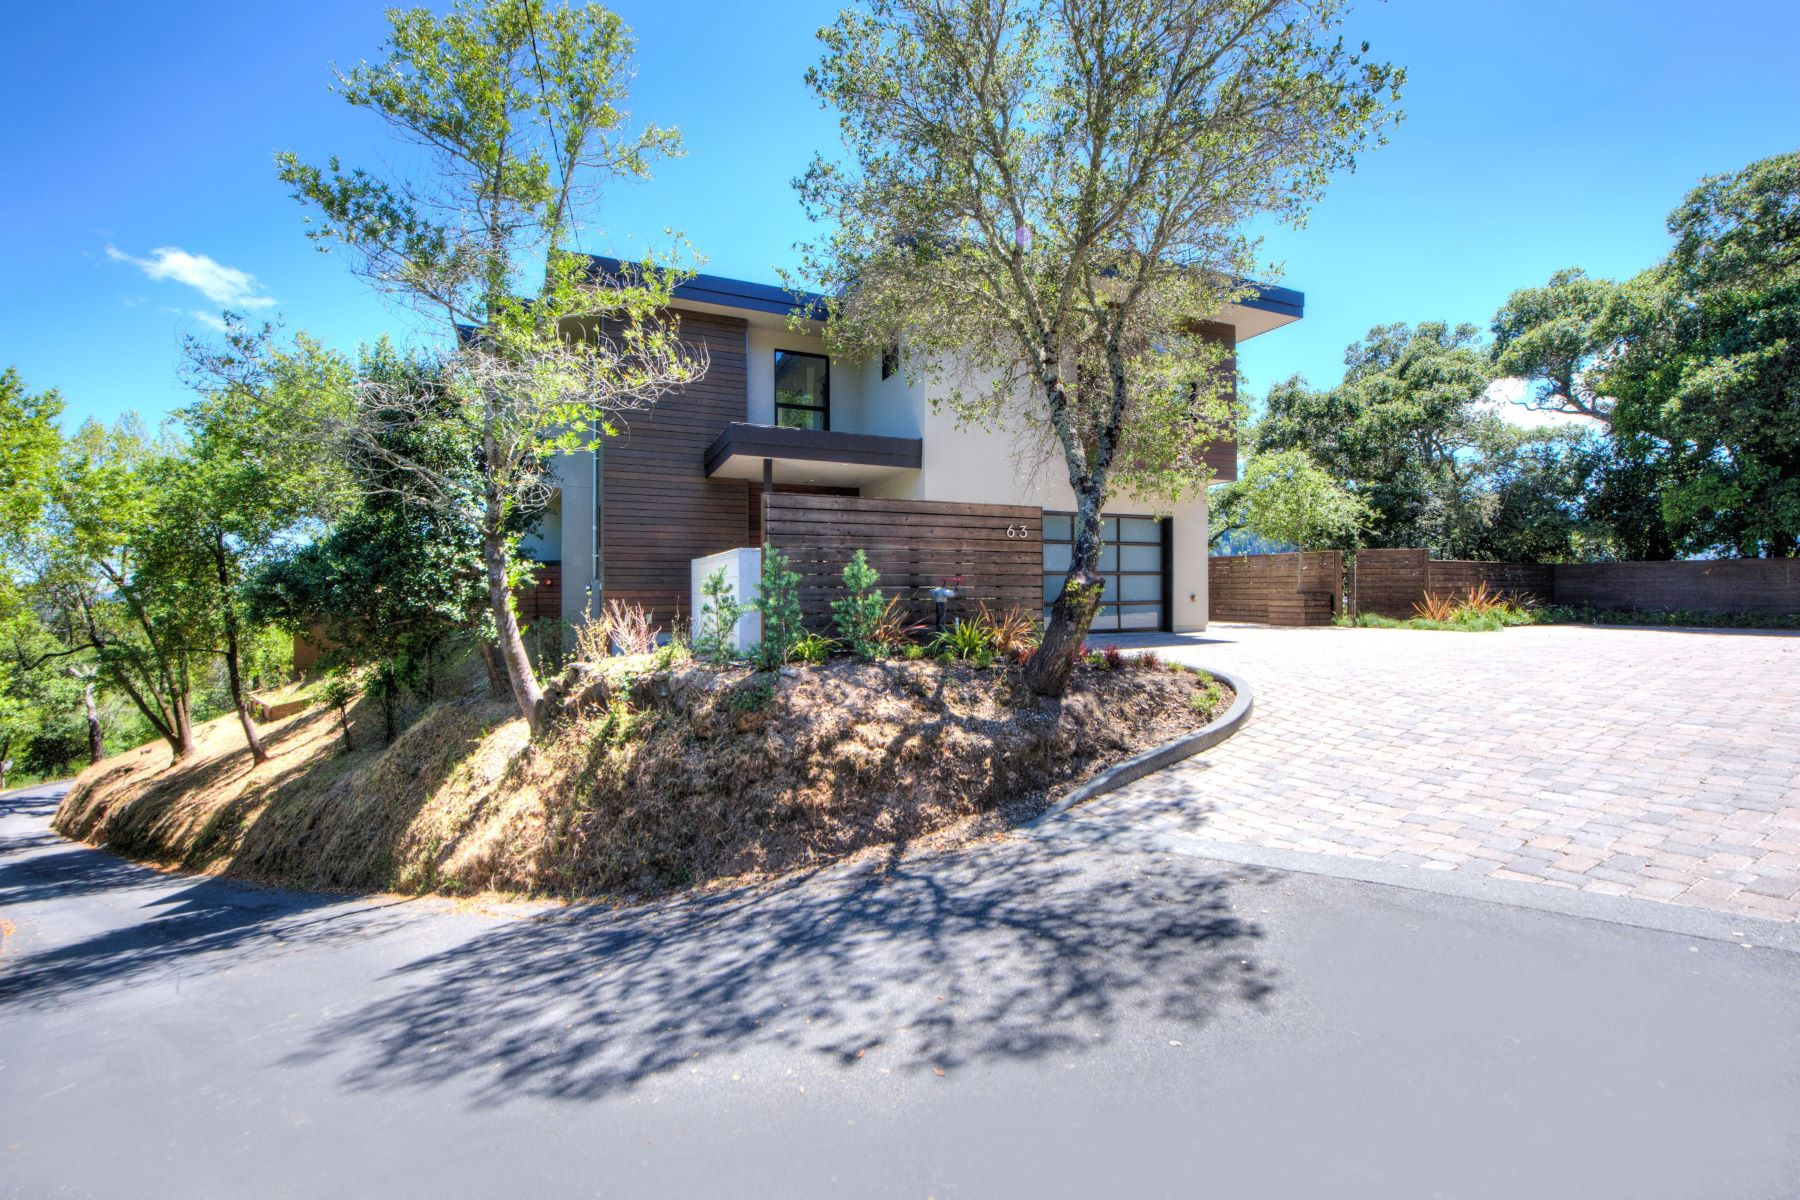 獨棟家庭住宅 為 出售 在 Modern Perfection in Ross 63 Monte Alegre Road Ross, 加利福尼亞州, 94957 美國